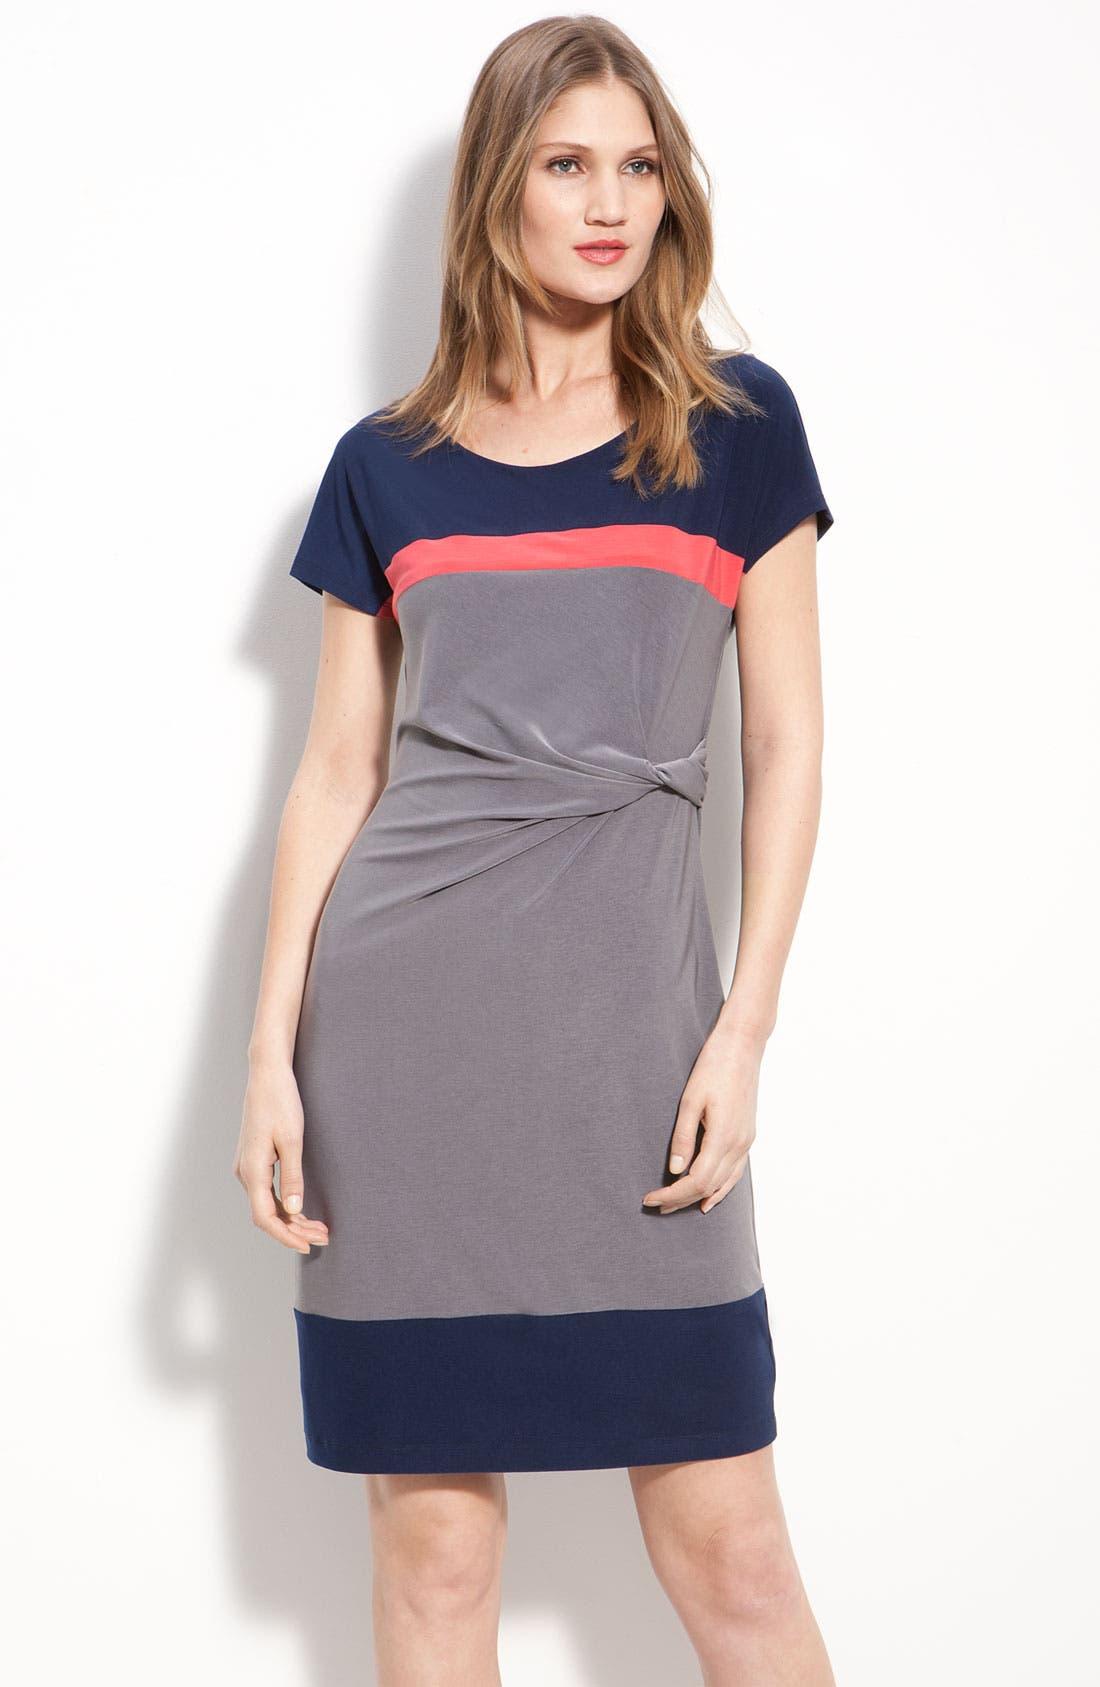 ALEX & AVA, Twist Front Colorblock Jersey Sheath Dress, Main thumbnail 1, color, 020